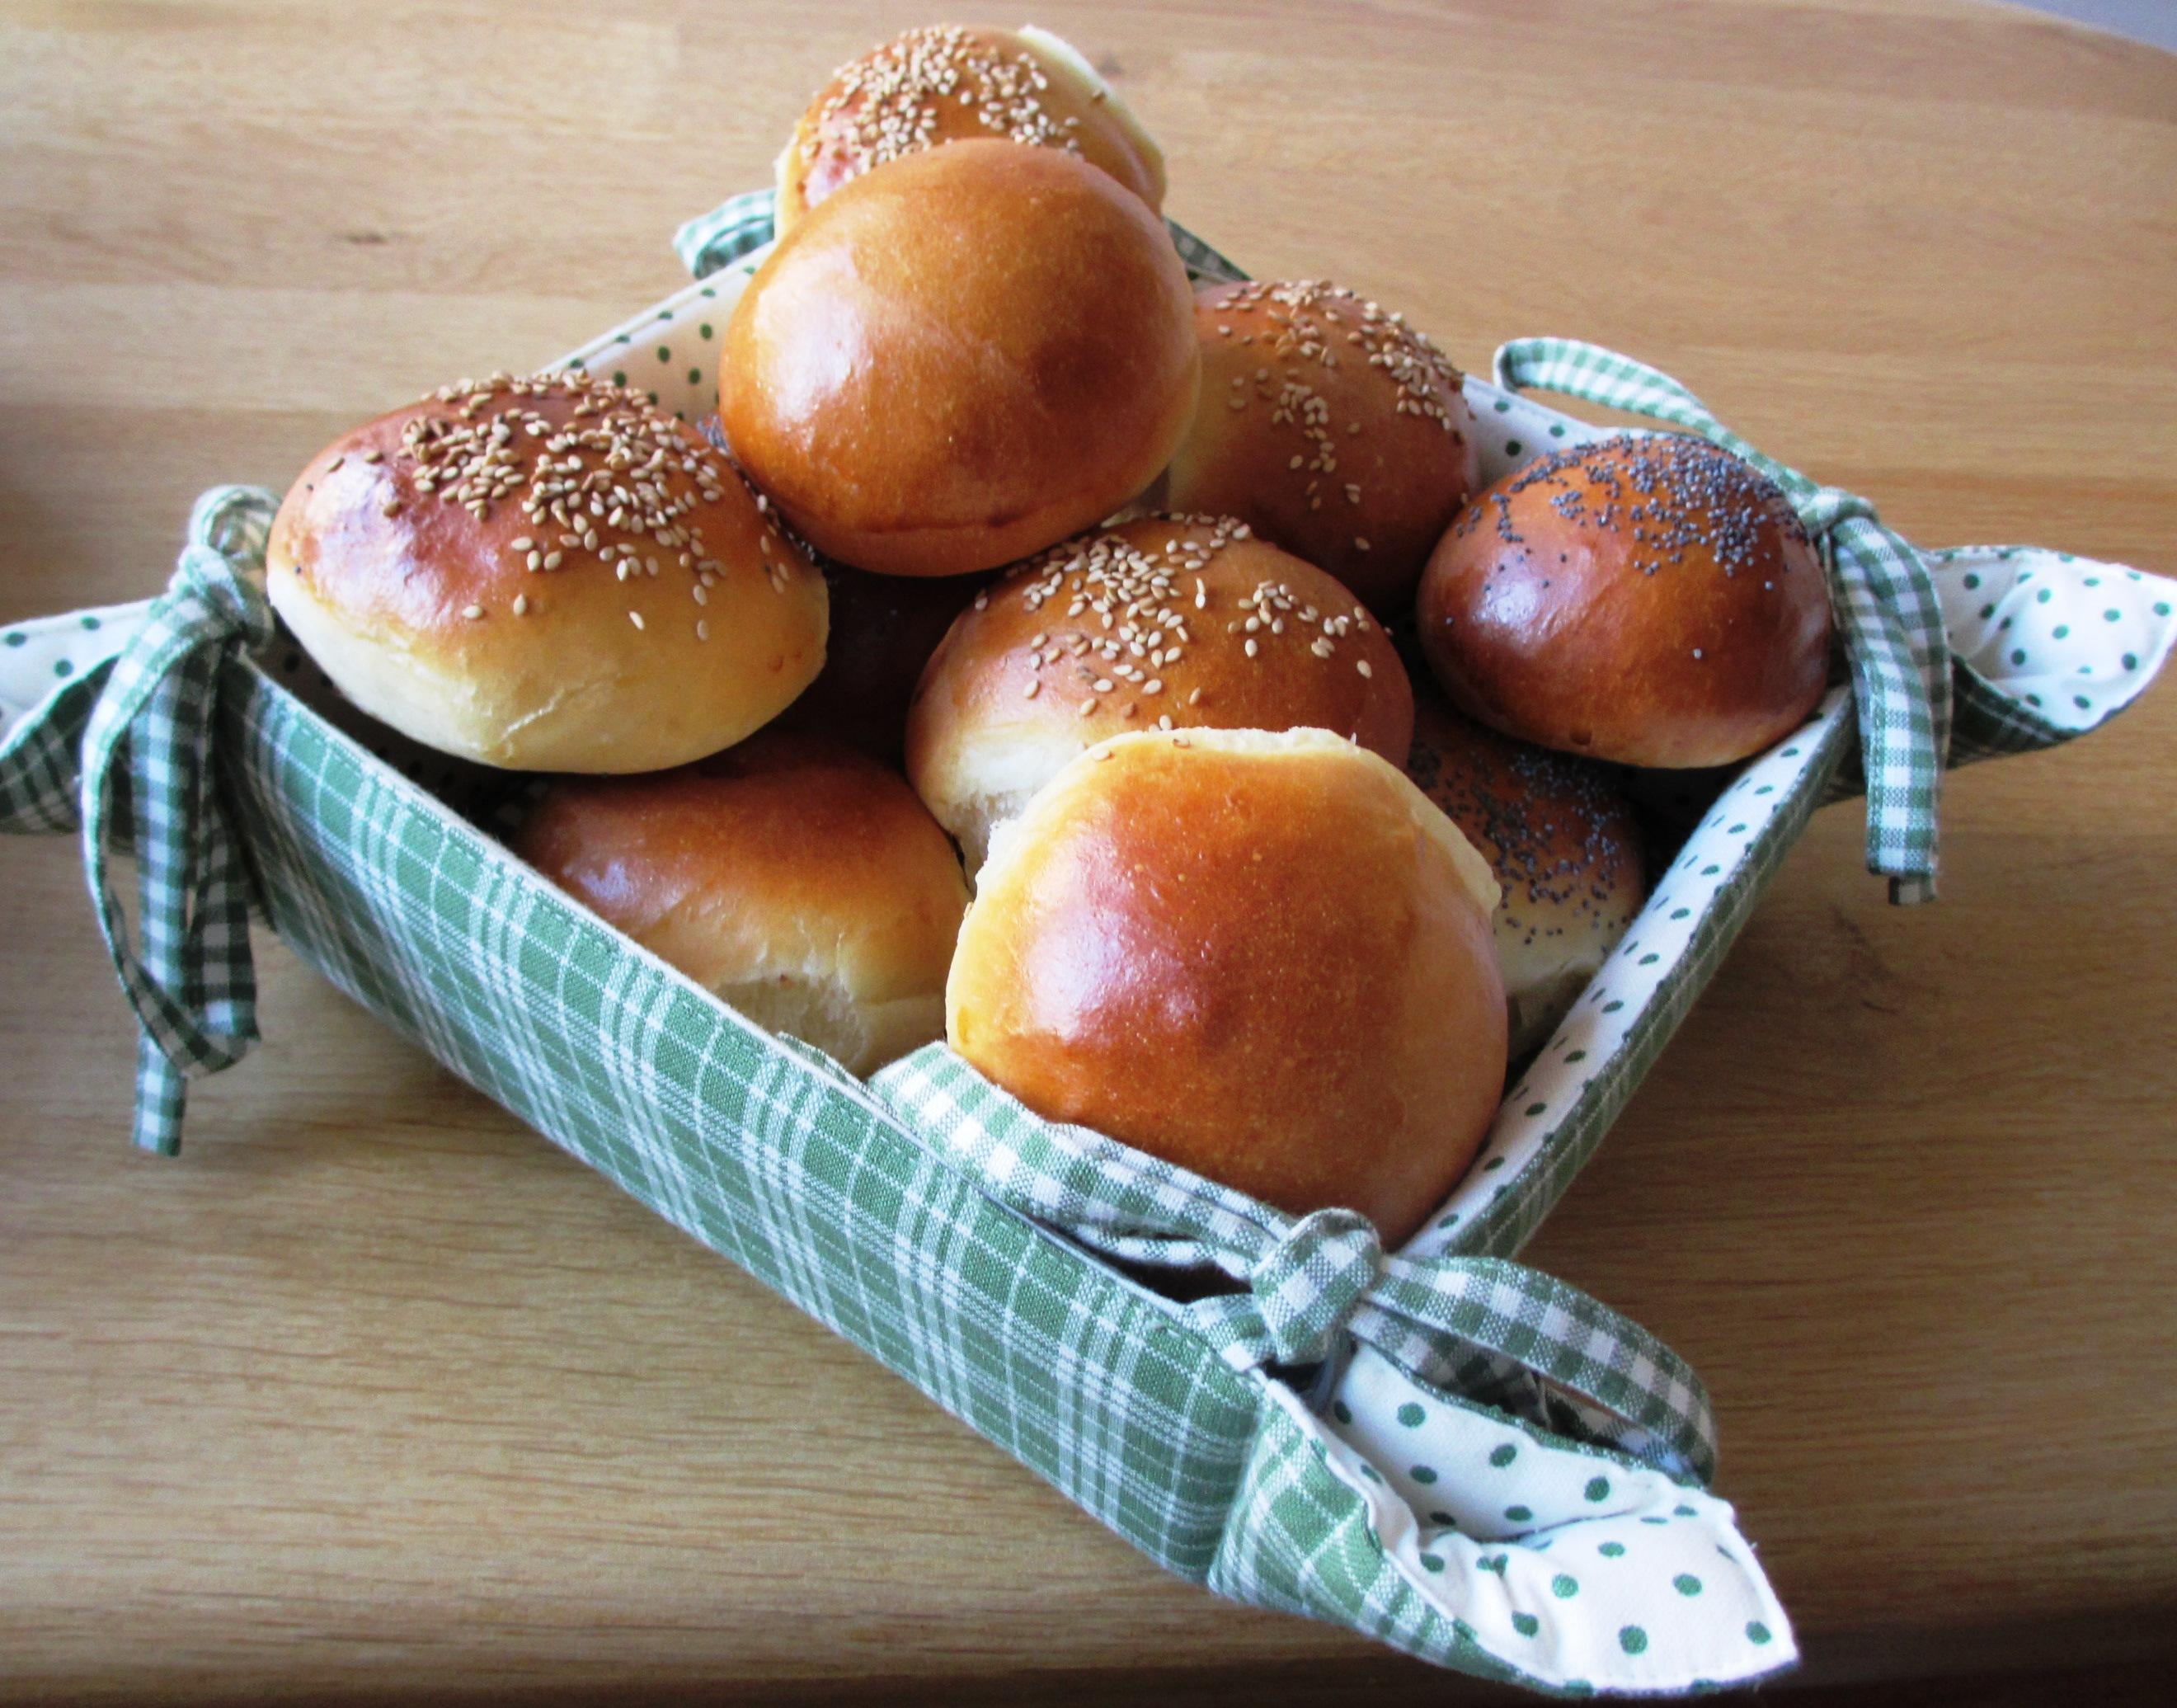 Broodmand zachte witte broodjes van Levine